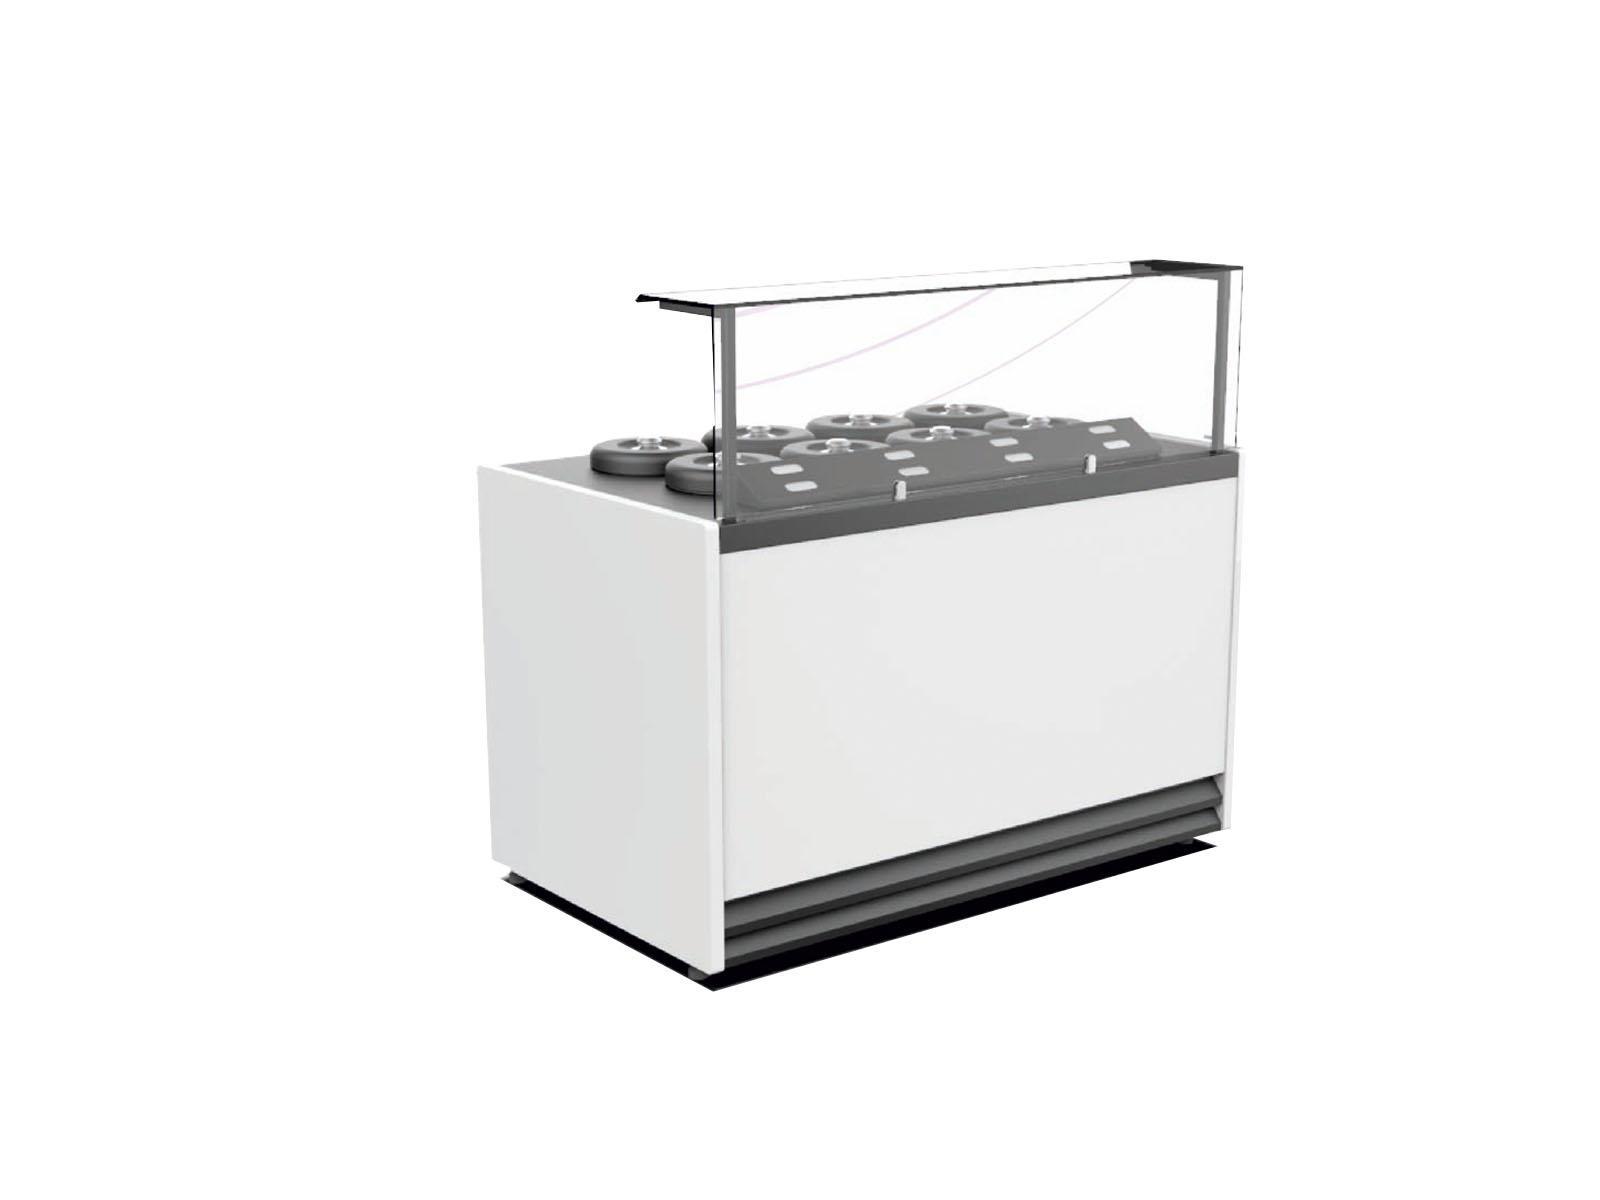 Ice-cream dispensers